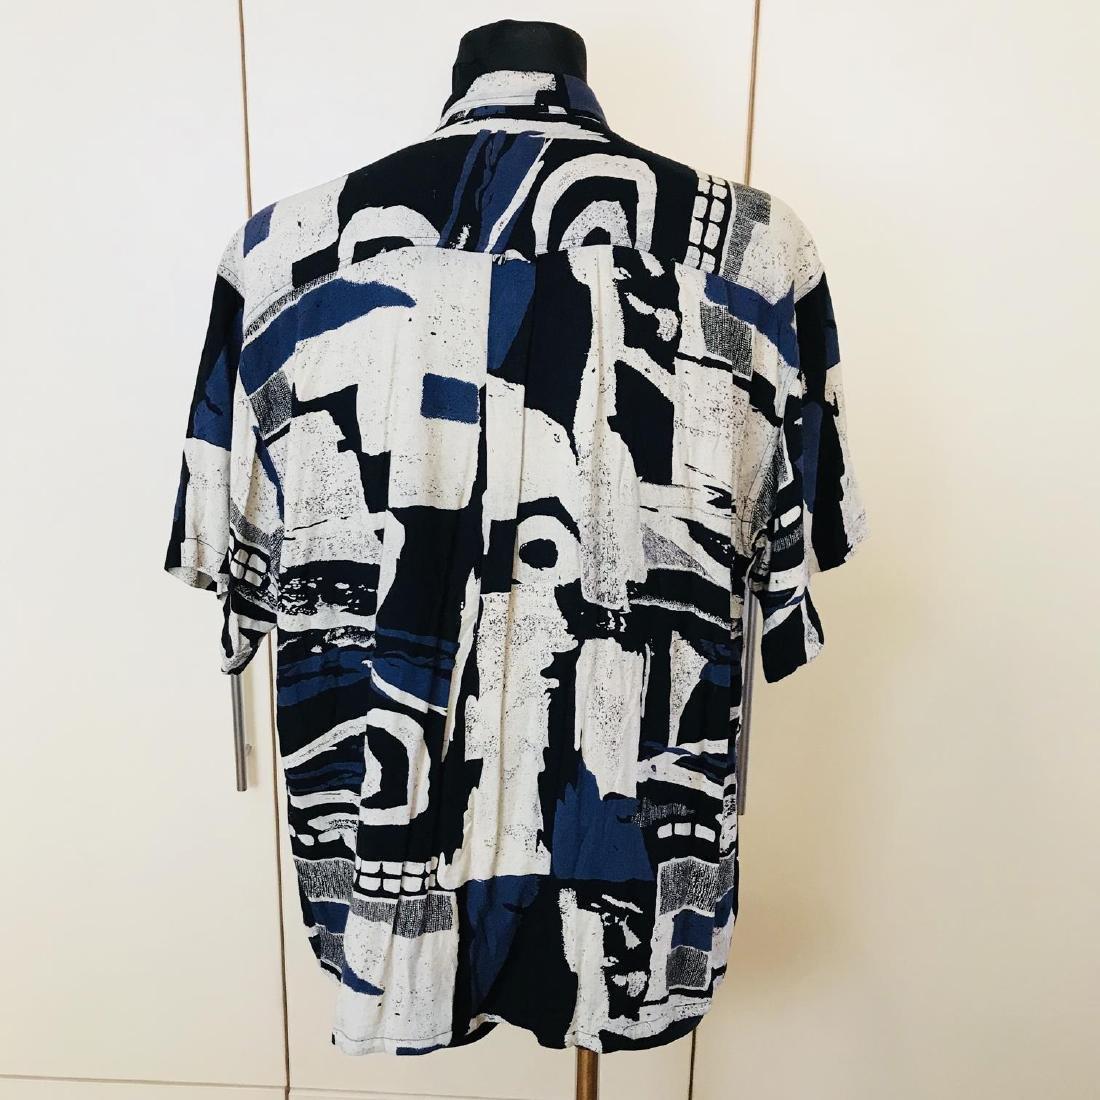 Vintage Men's DAYTON Hawaiian Shirt Top Size XL - 5